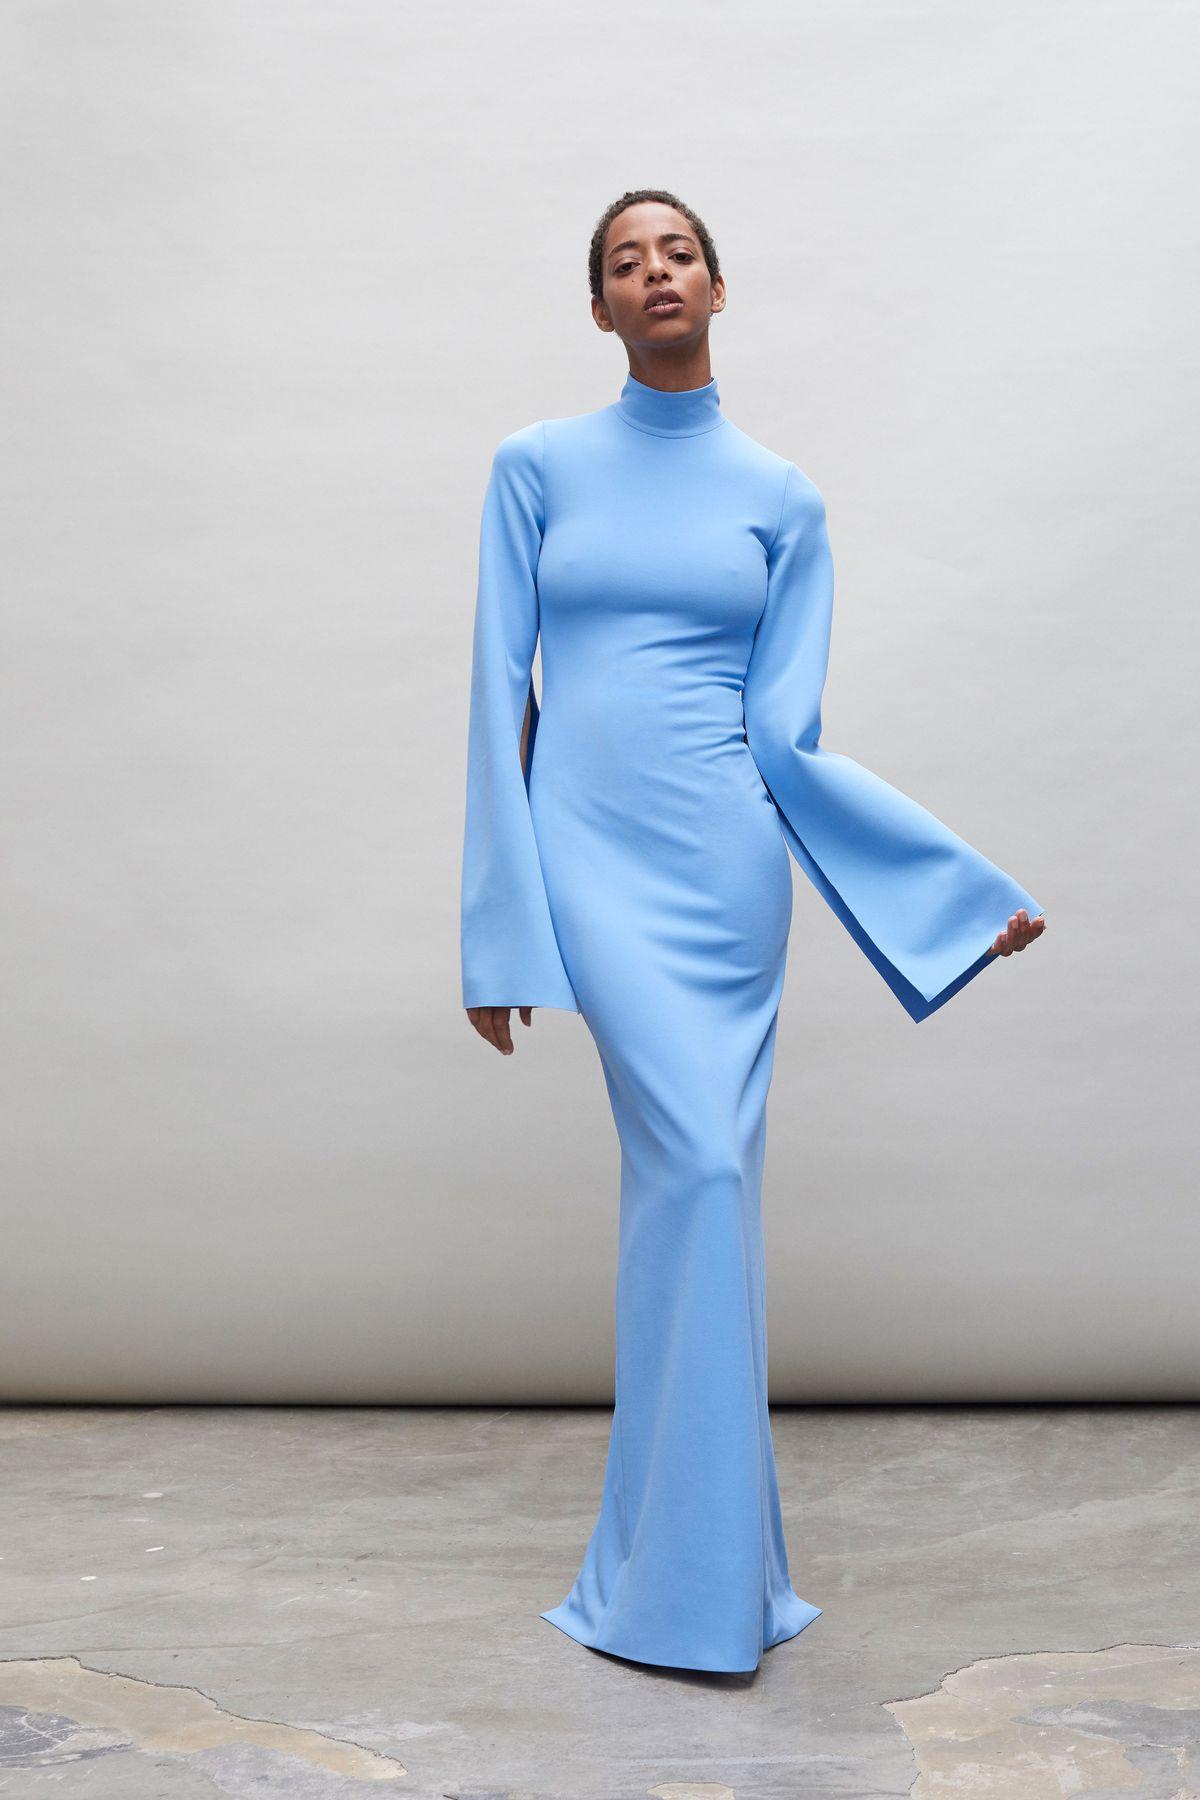 Solace London Resort 2019 London Collection - Vogue #fashion #blackgirlmagic #blackgirlsrock